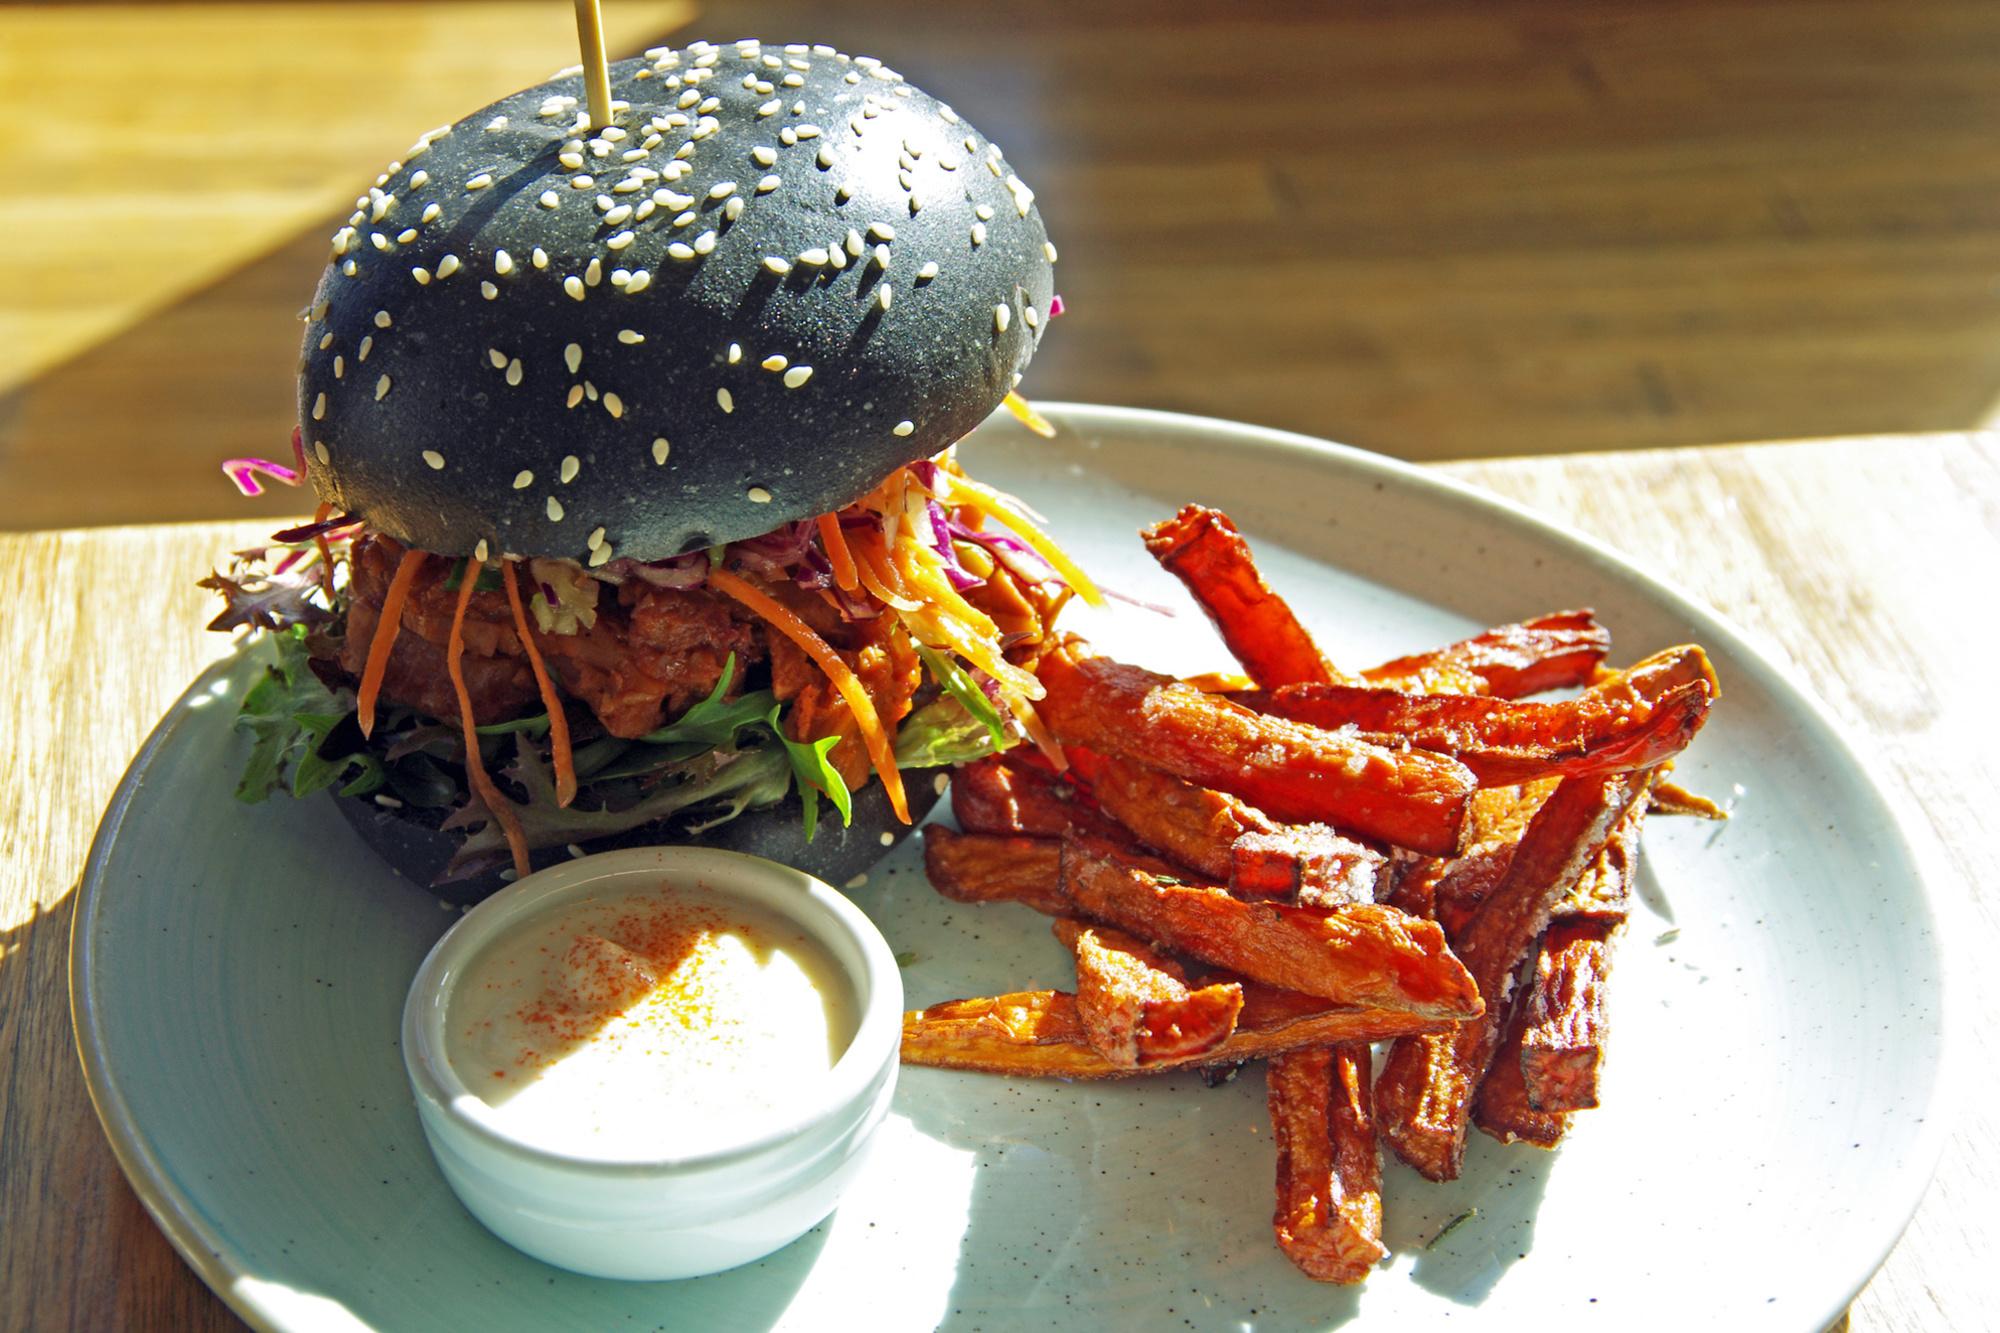 Vegan burger, gf